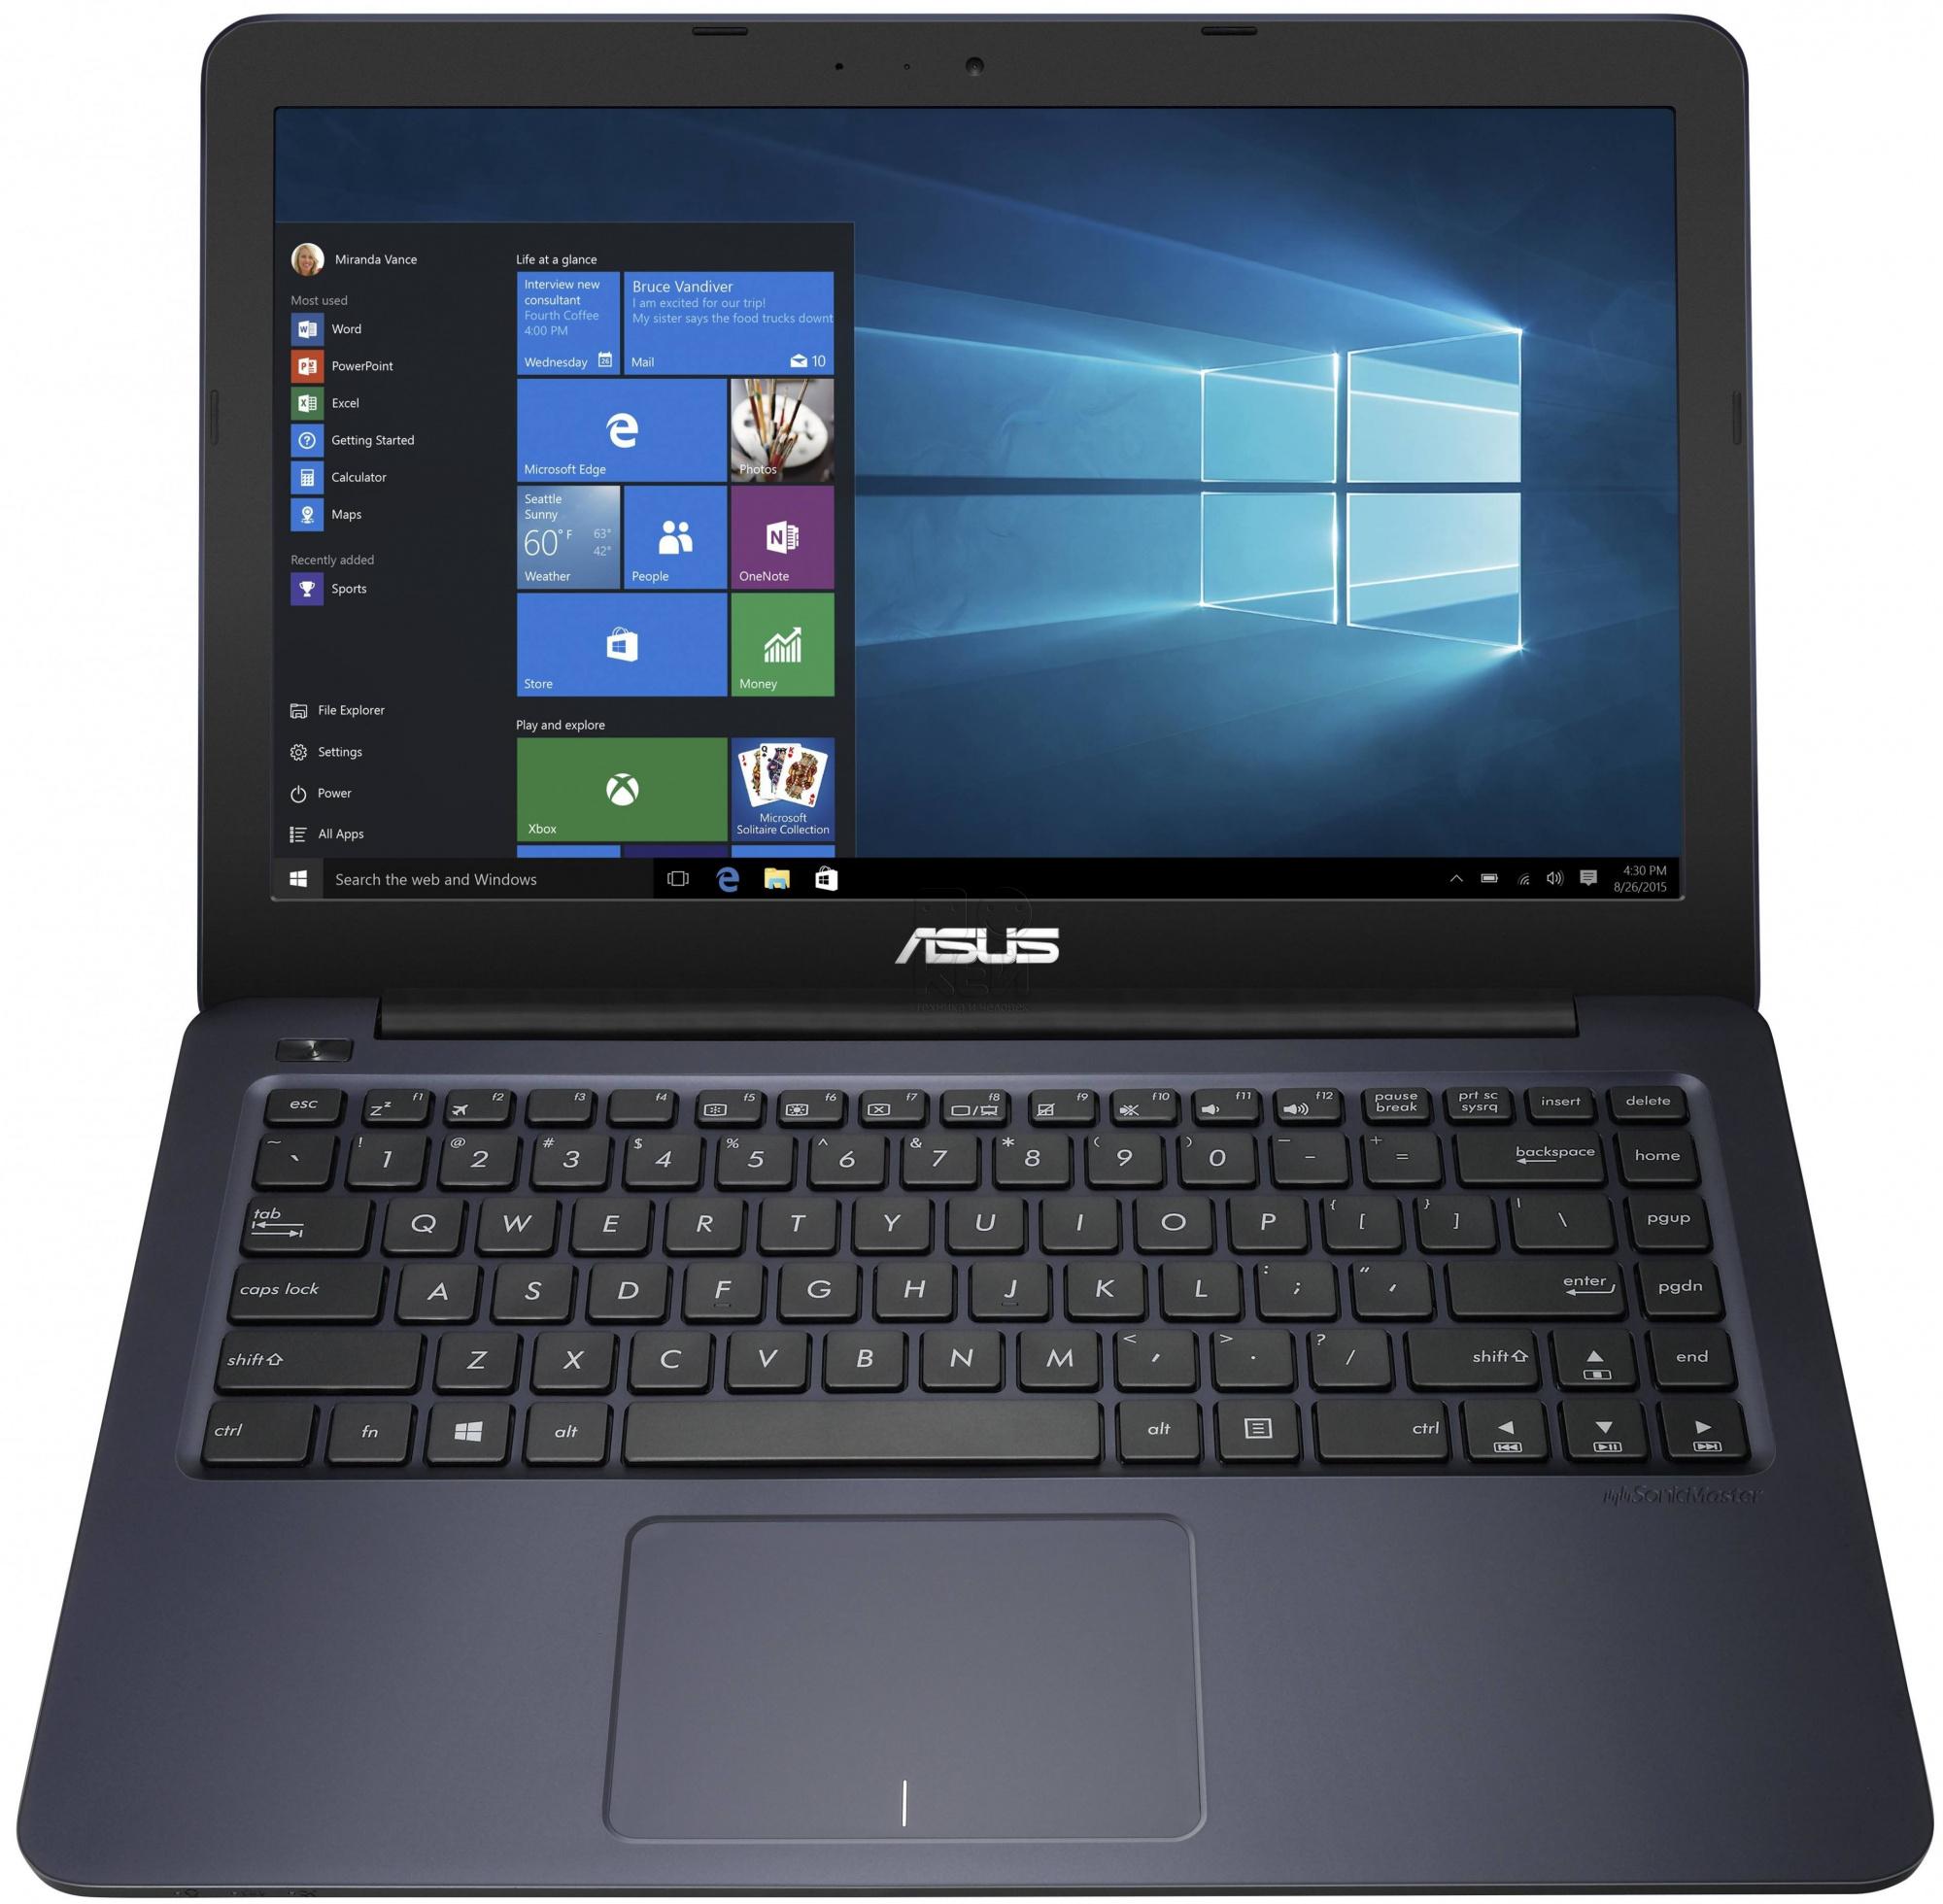 Ноутбук Asus E402SA-WX016T 14.0 Intel Celeron N3050 1.6Ghz, 2Gb, 32Gb SSD (90NB0B63-M00780) Black ноутбук asus k751sj ty020d 90nb07s1 m00320